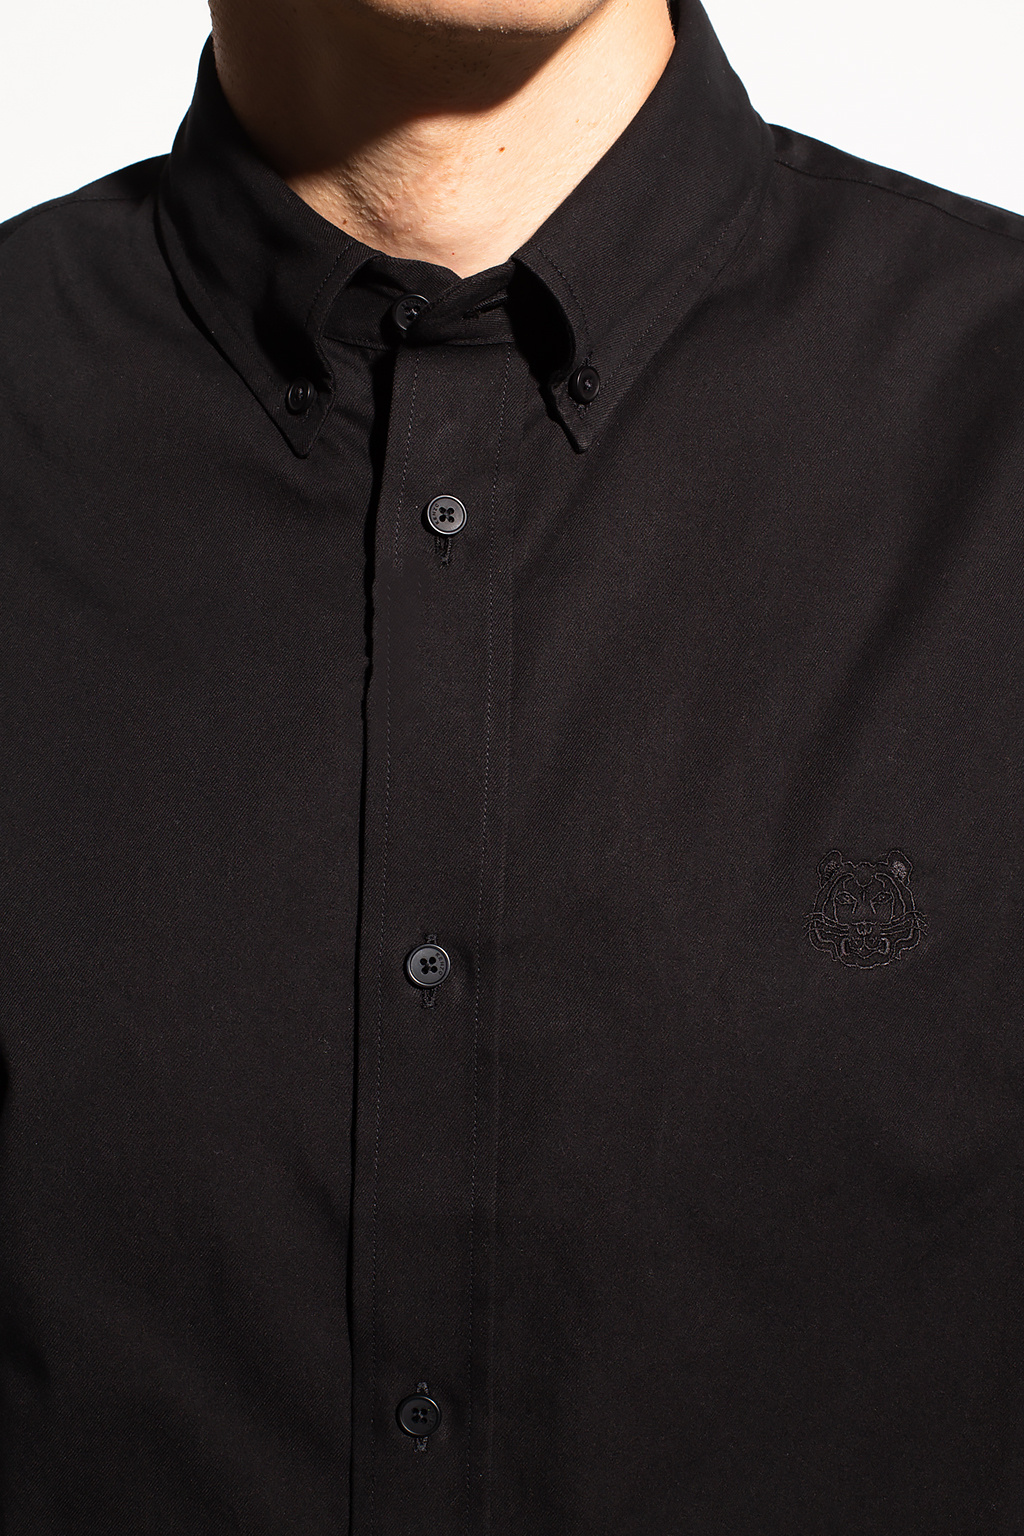 Kenzo logo衬衫